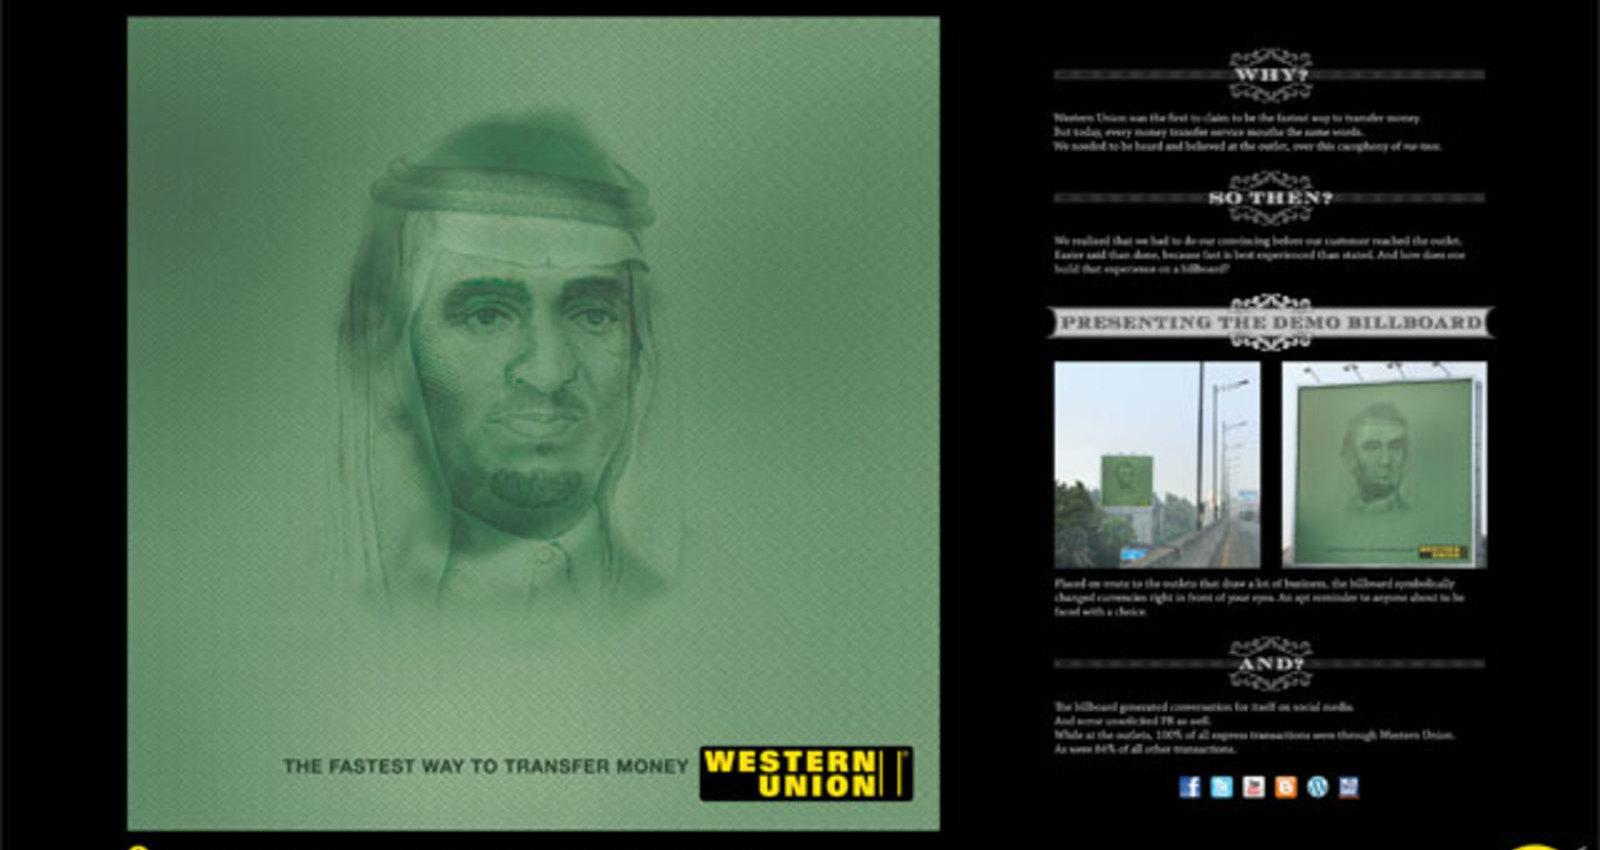 Western Union Demo Billboards